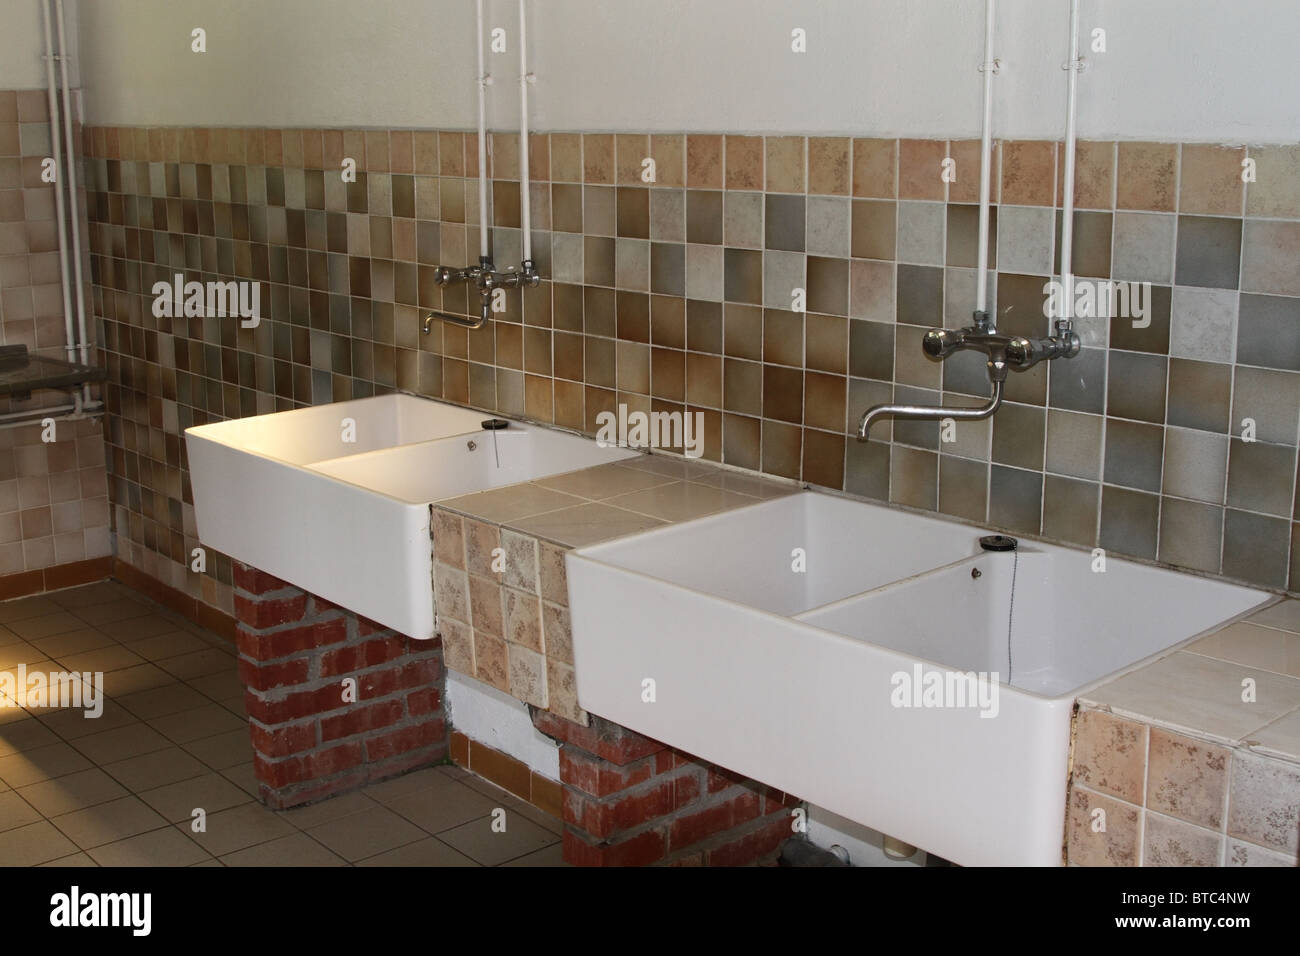 https www alamy com stock photo deep white porcelain clothes washing laundry sinks on a campsite caravan 32229285 html